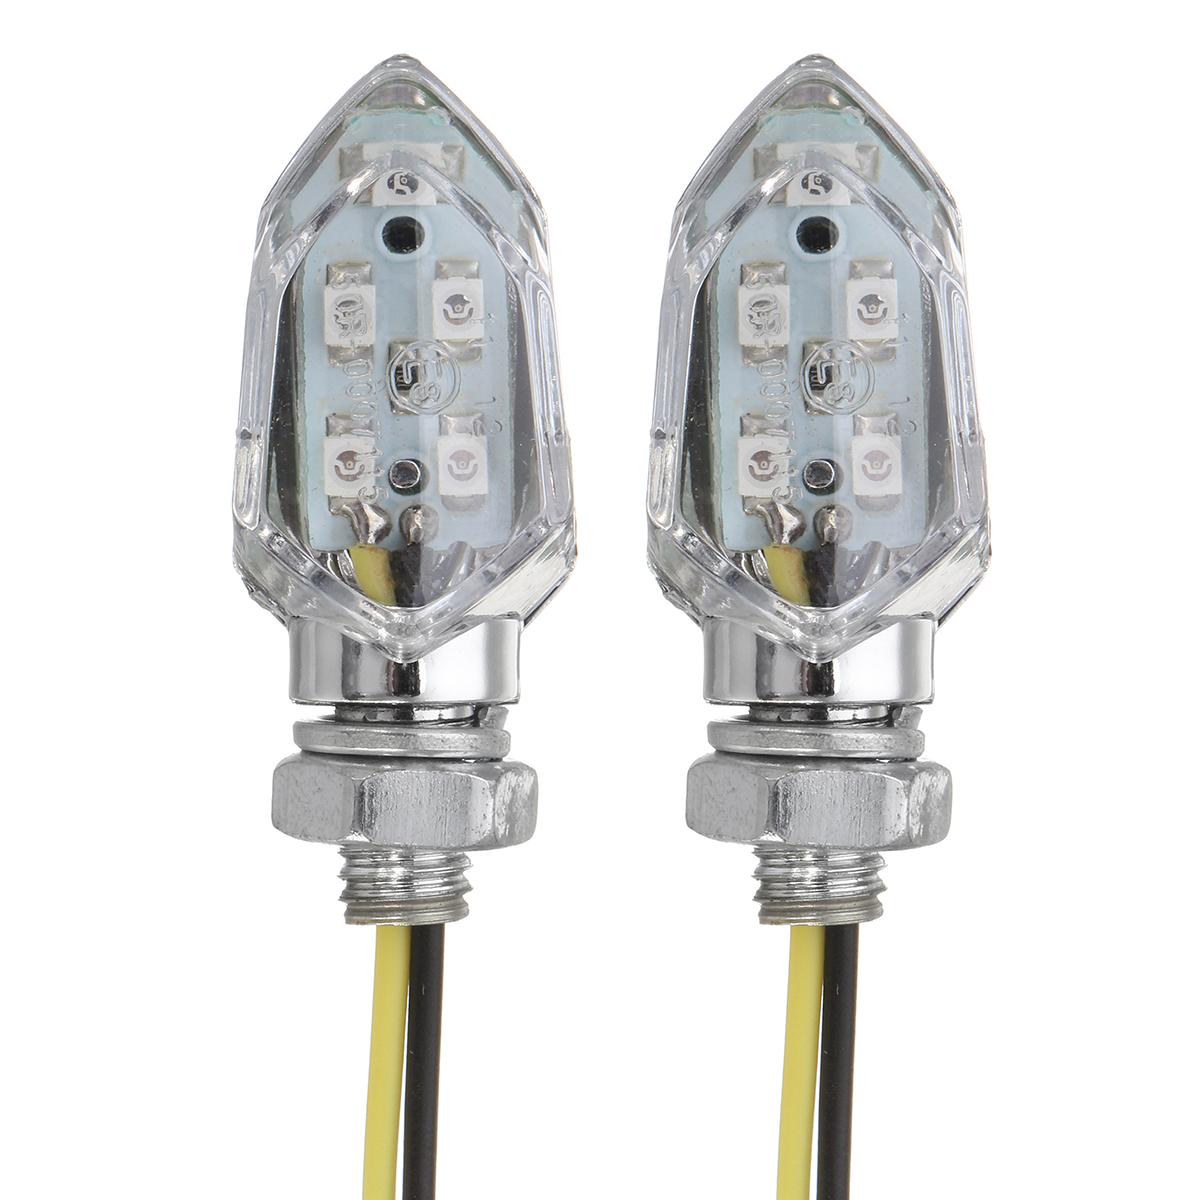 5 SMD LED Turn Signal Amber Mini Motorcycle Blinker Indicators Lights